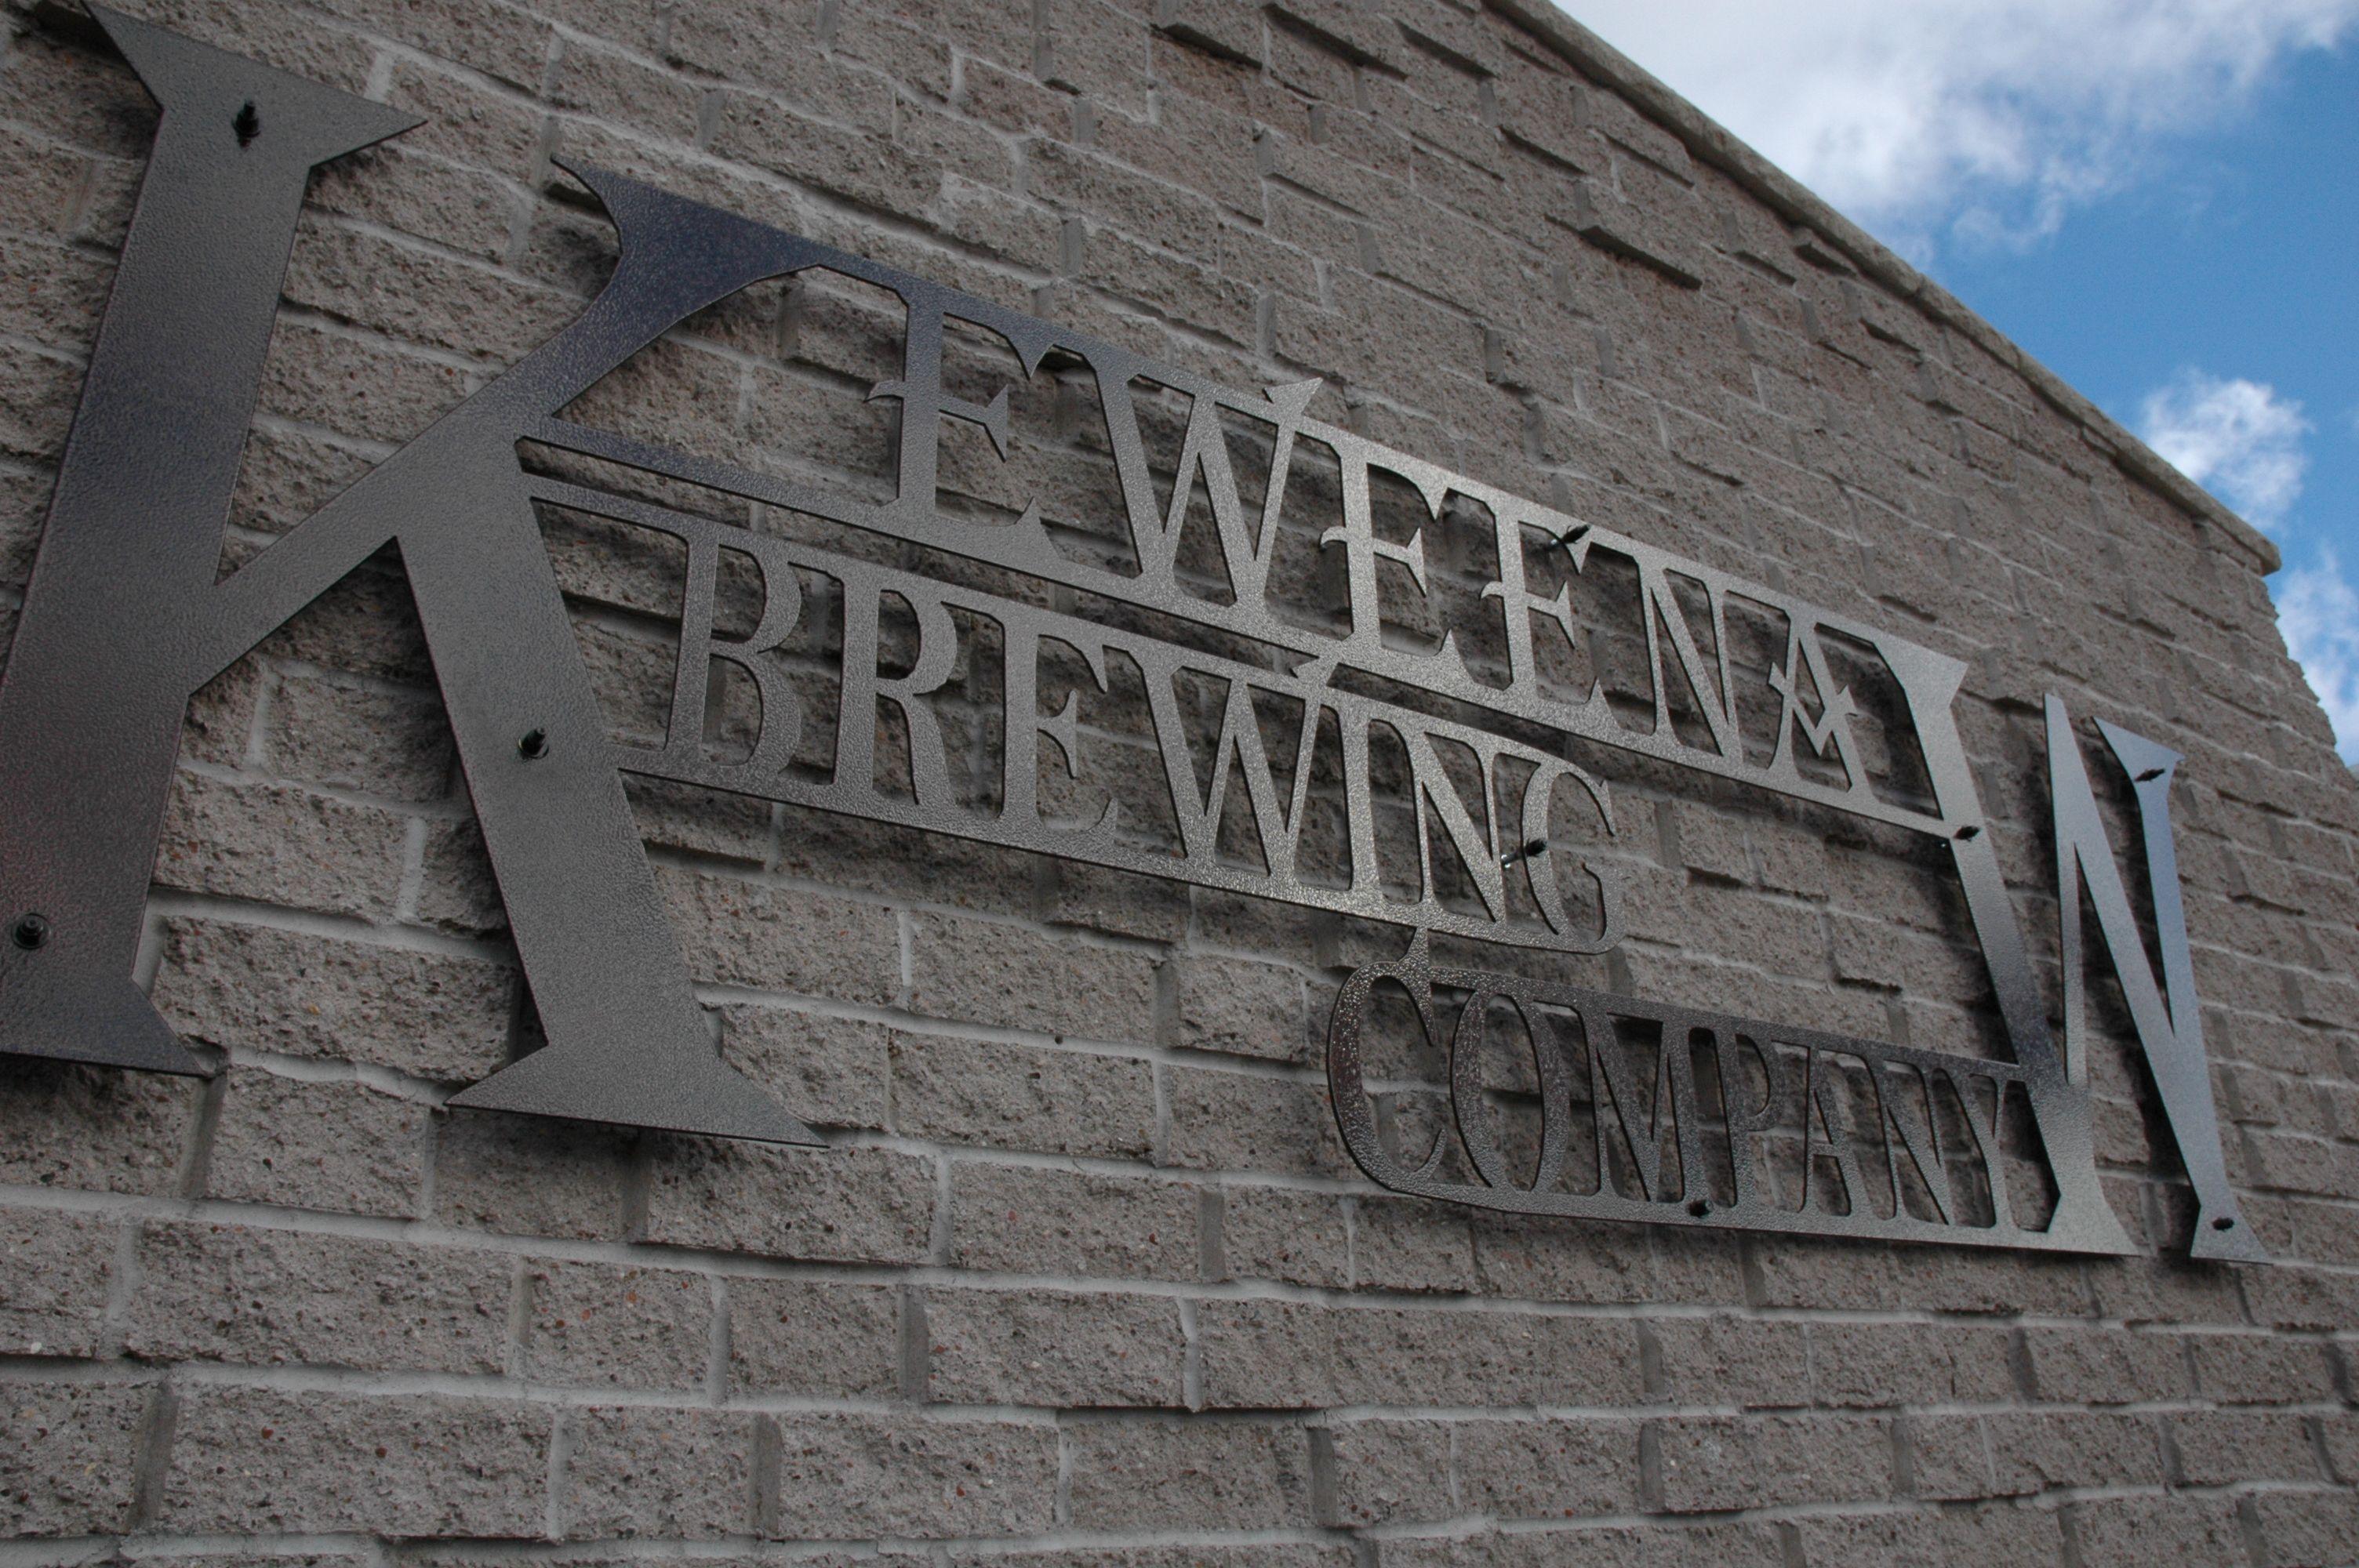 Keweenaw Brewing Company Craft brewing, Michigan crafts